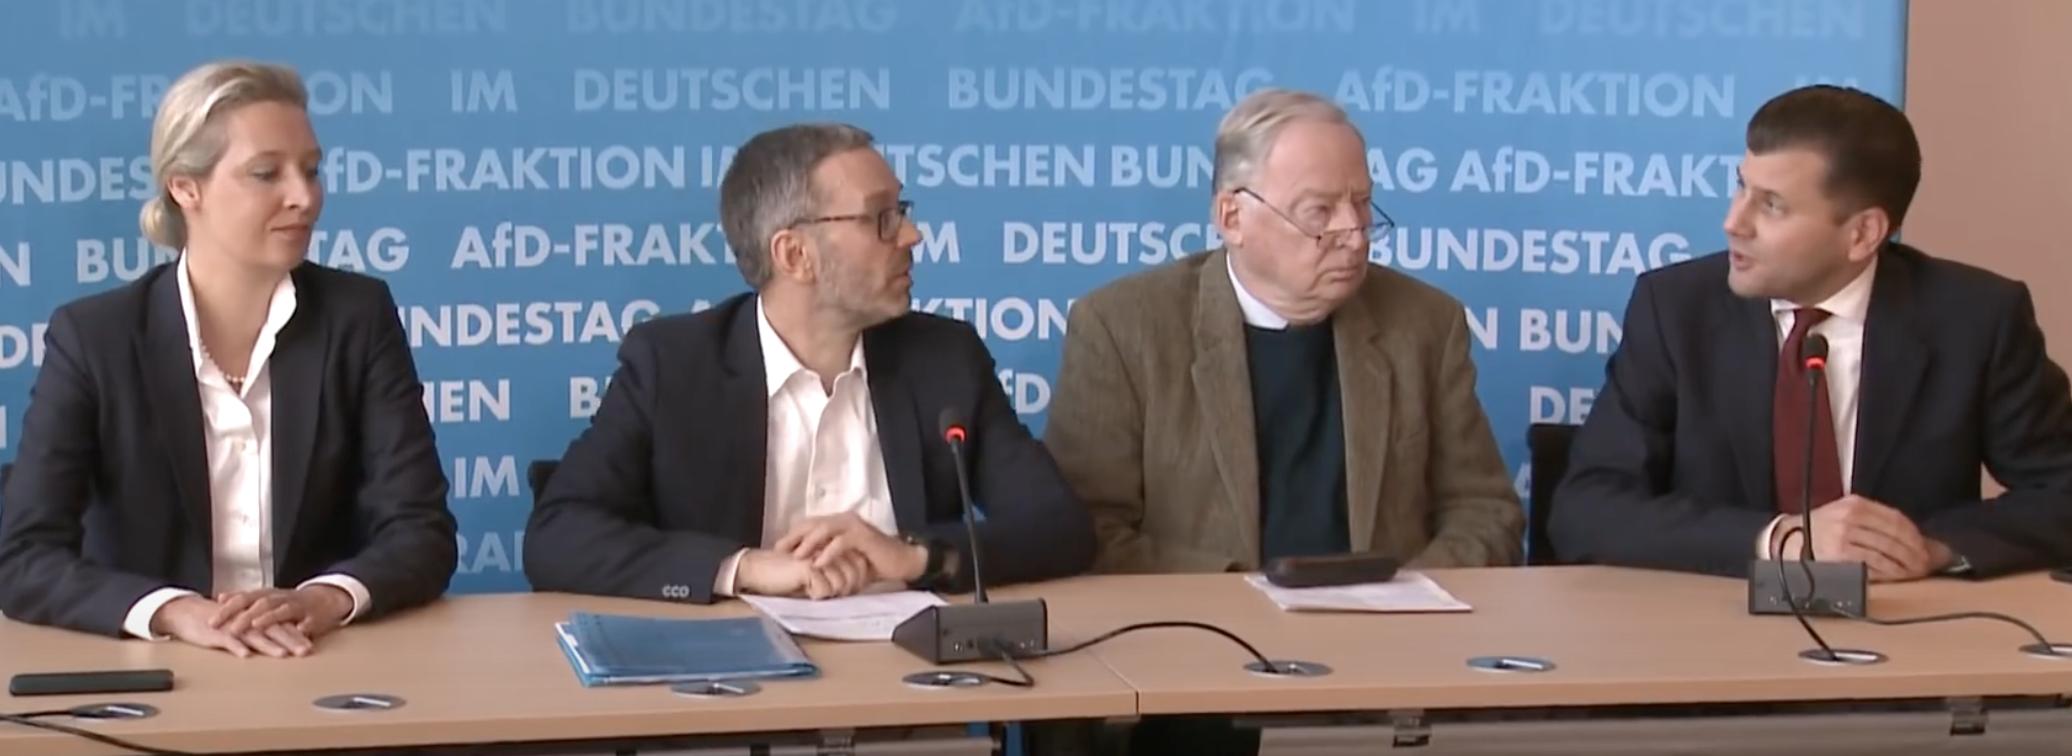 Alice Weidel, Herbert Kickl, Alexander Gauland, Christian Lüth bei Pressekonferenz am 28.1.20 in Berlin (Screenshot FPÖ TV)